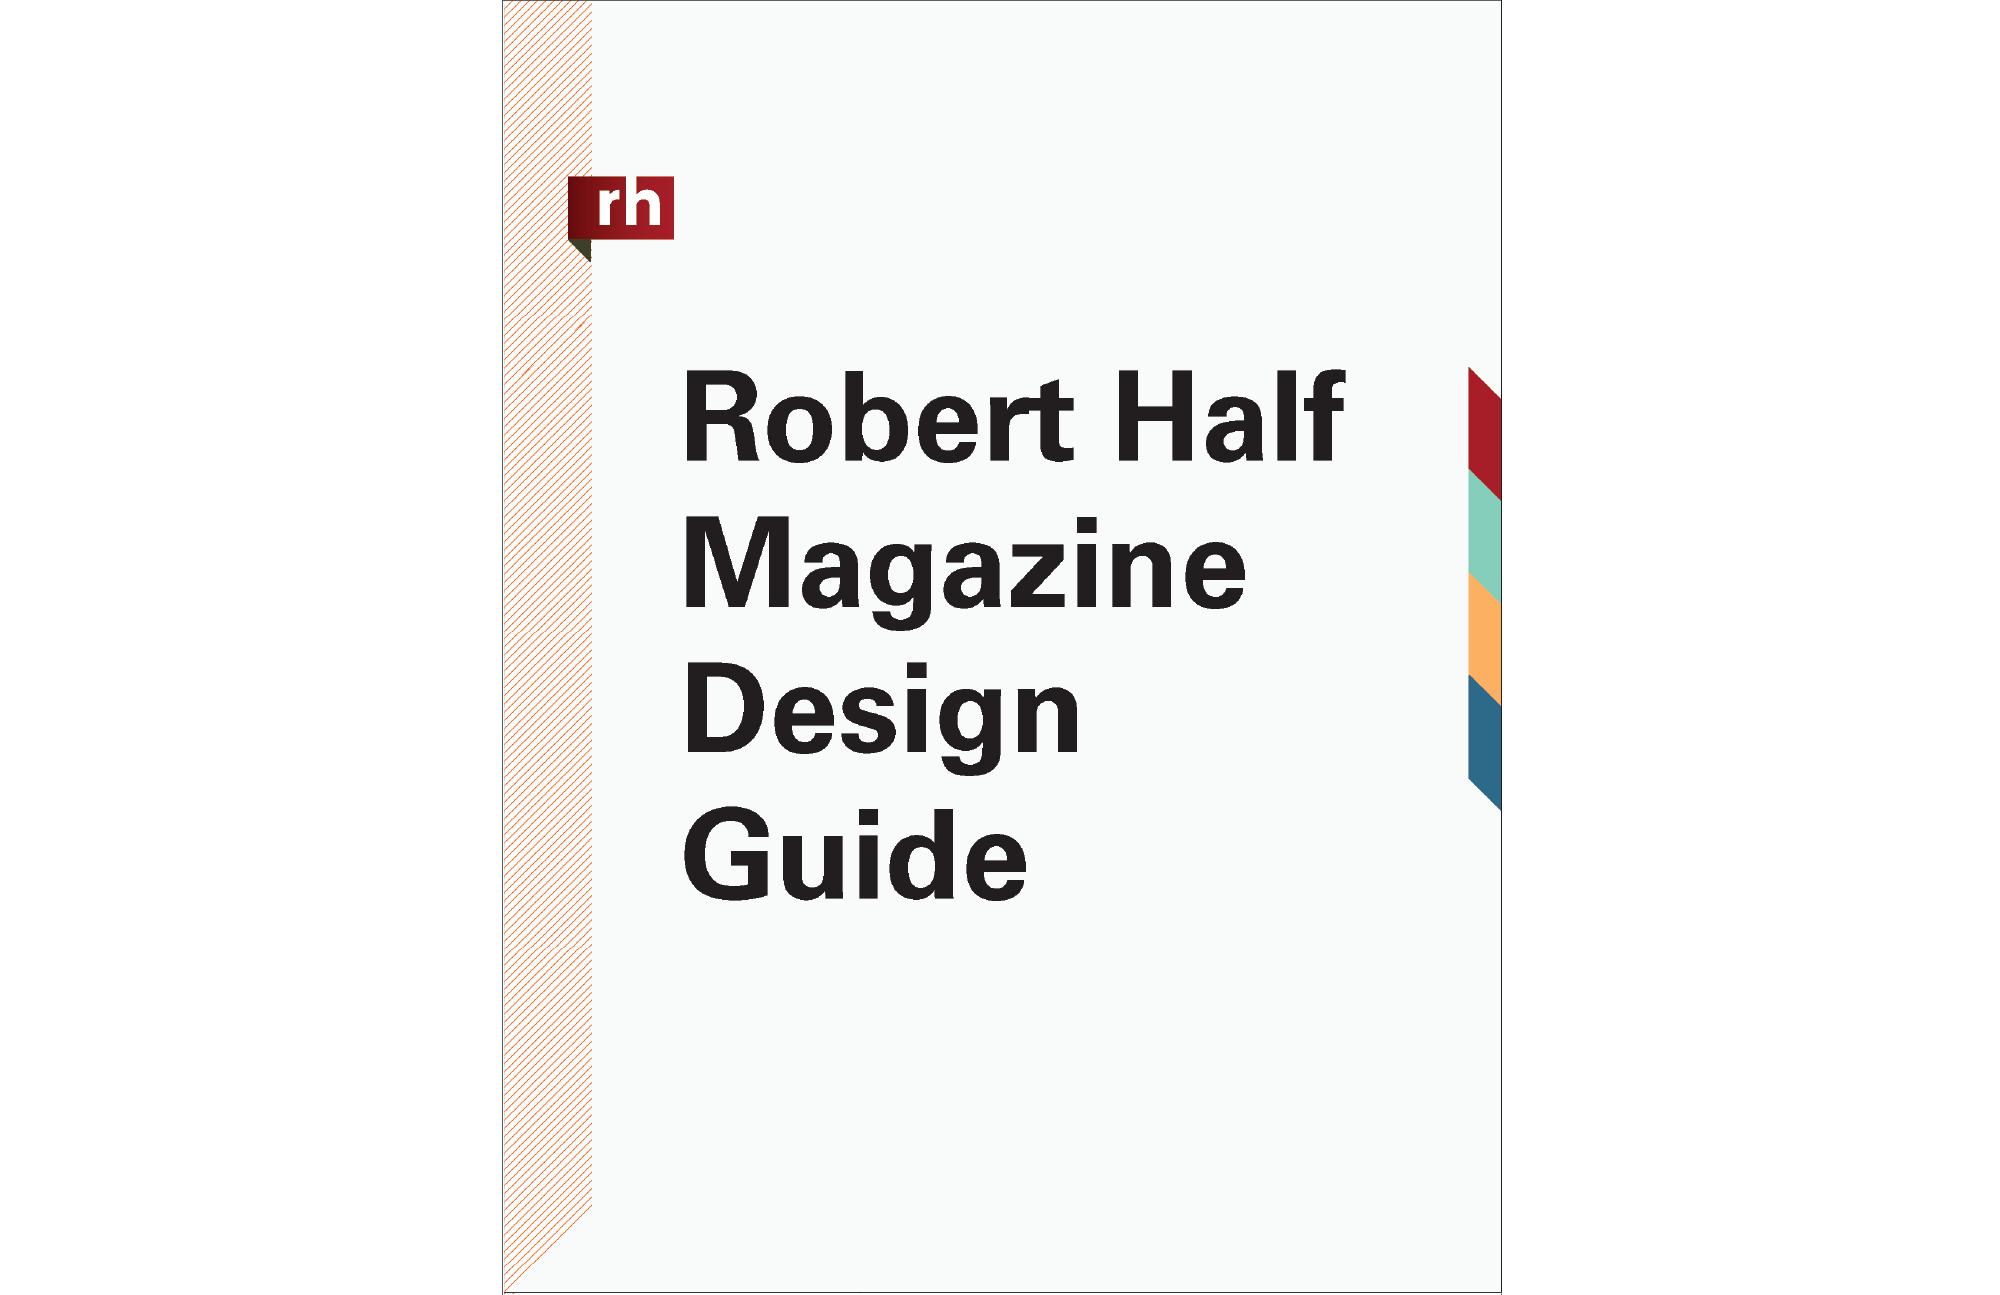 RH_styleguide_cover_kellygreen.jpg